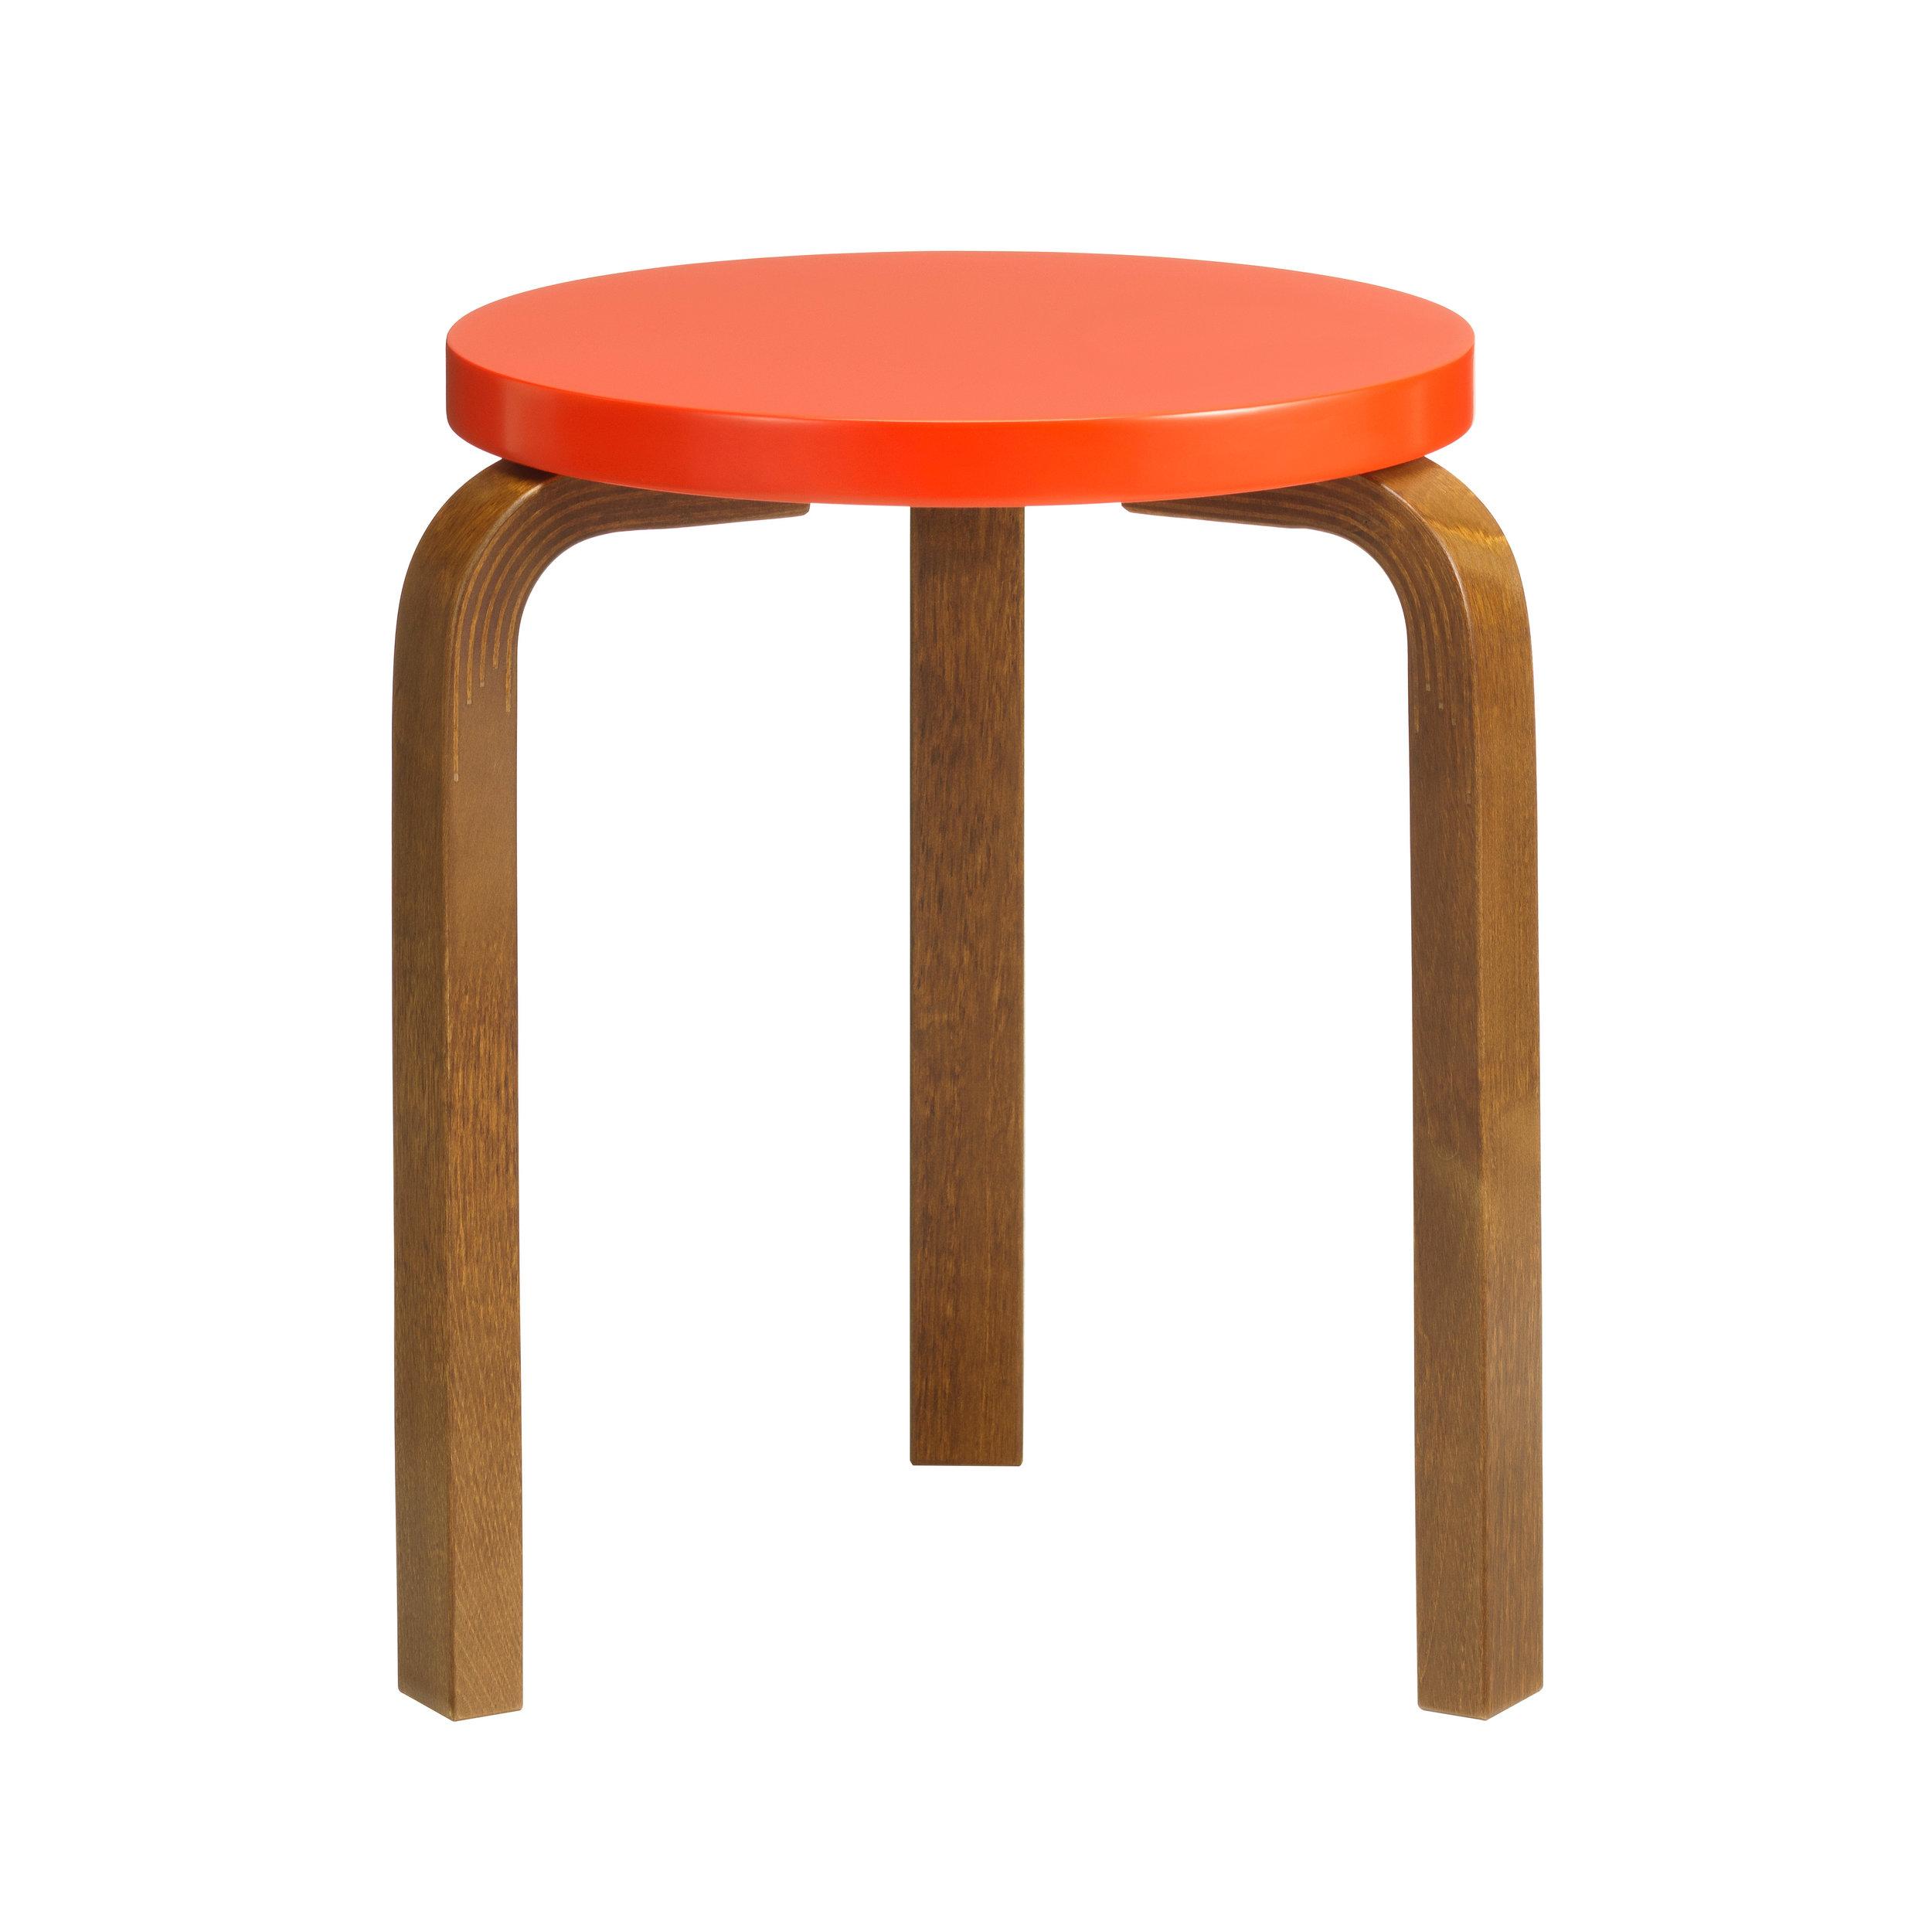 Stool 60 Legs: birch, walnut stain Seat: birch, bright red lacquer